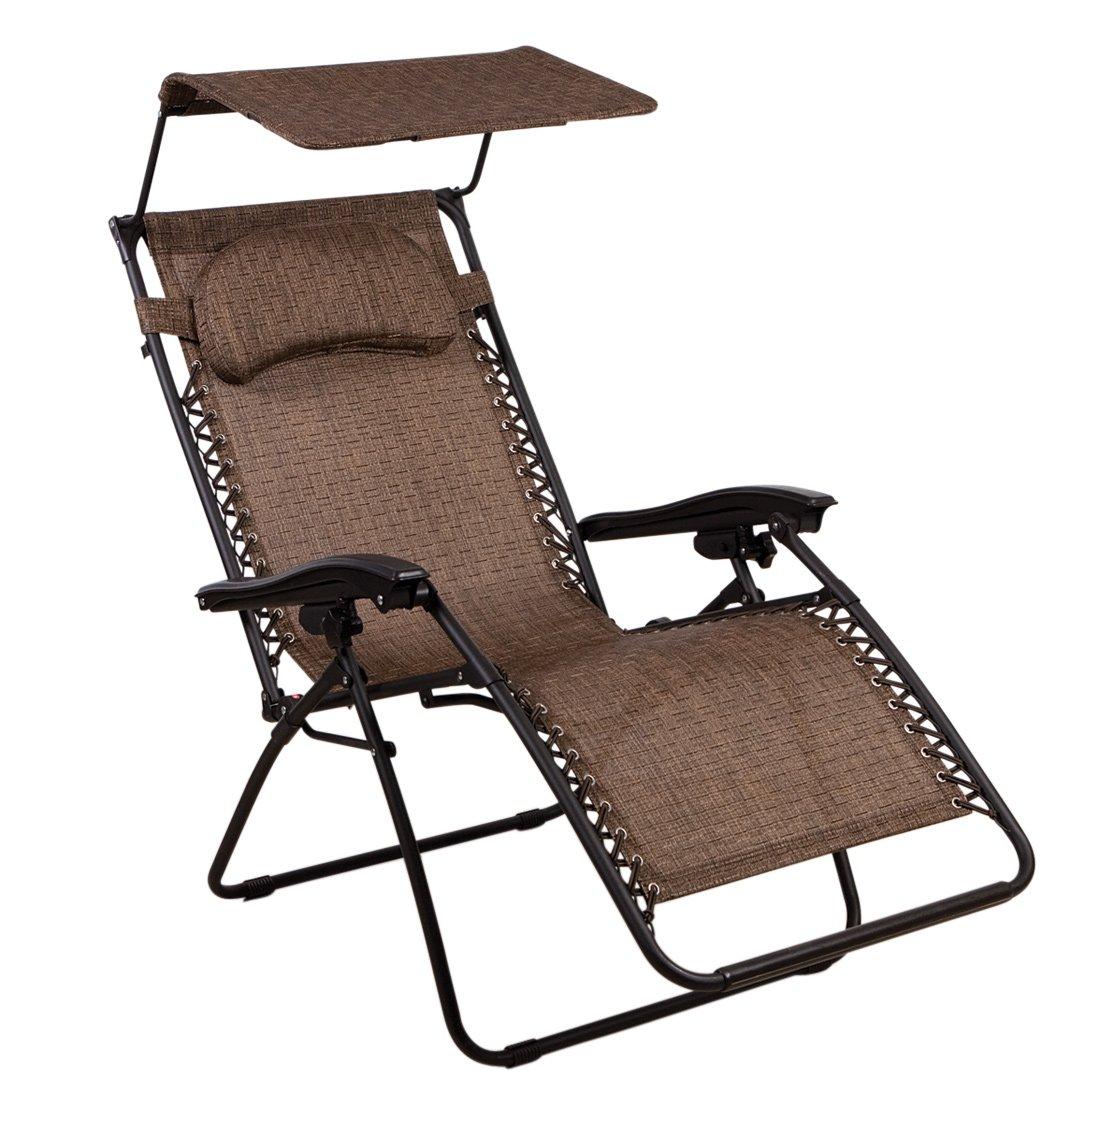 Top 2 oversized zero gravity chairs - Summerwinds